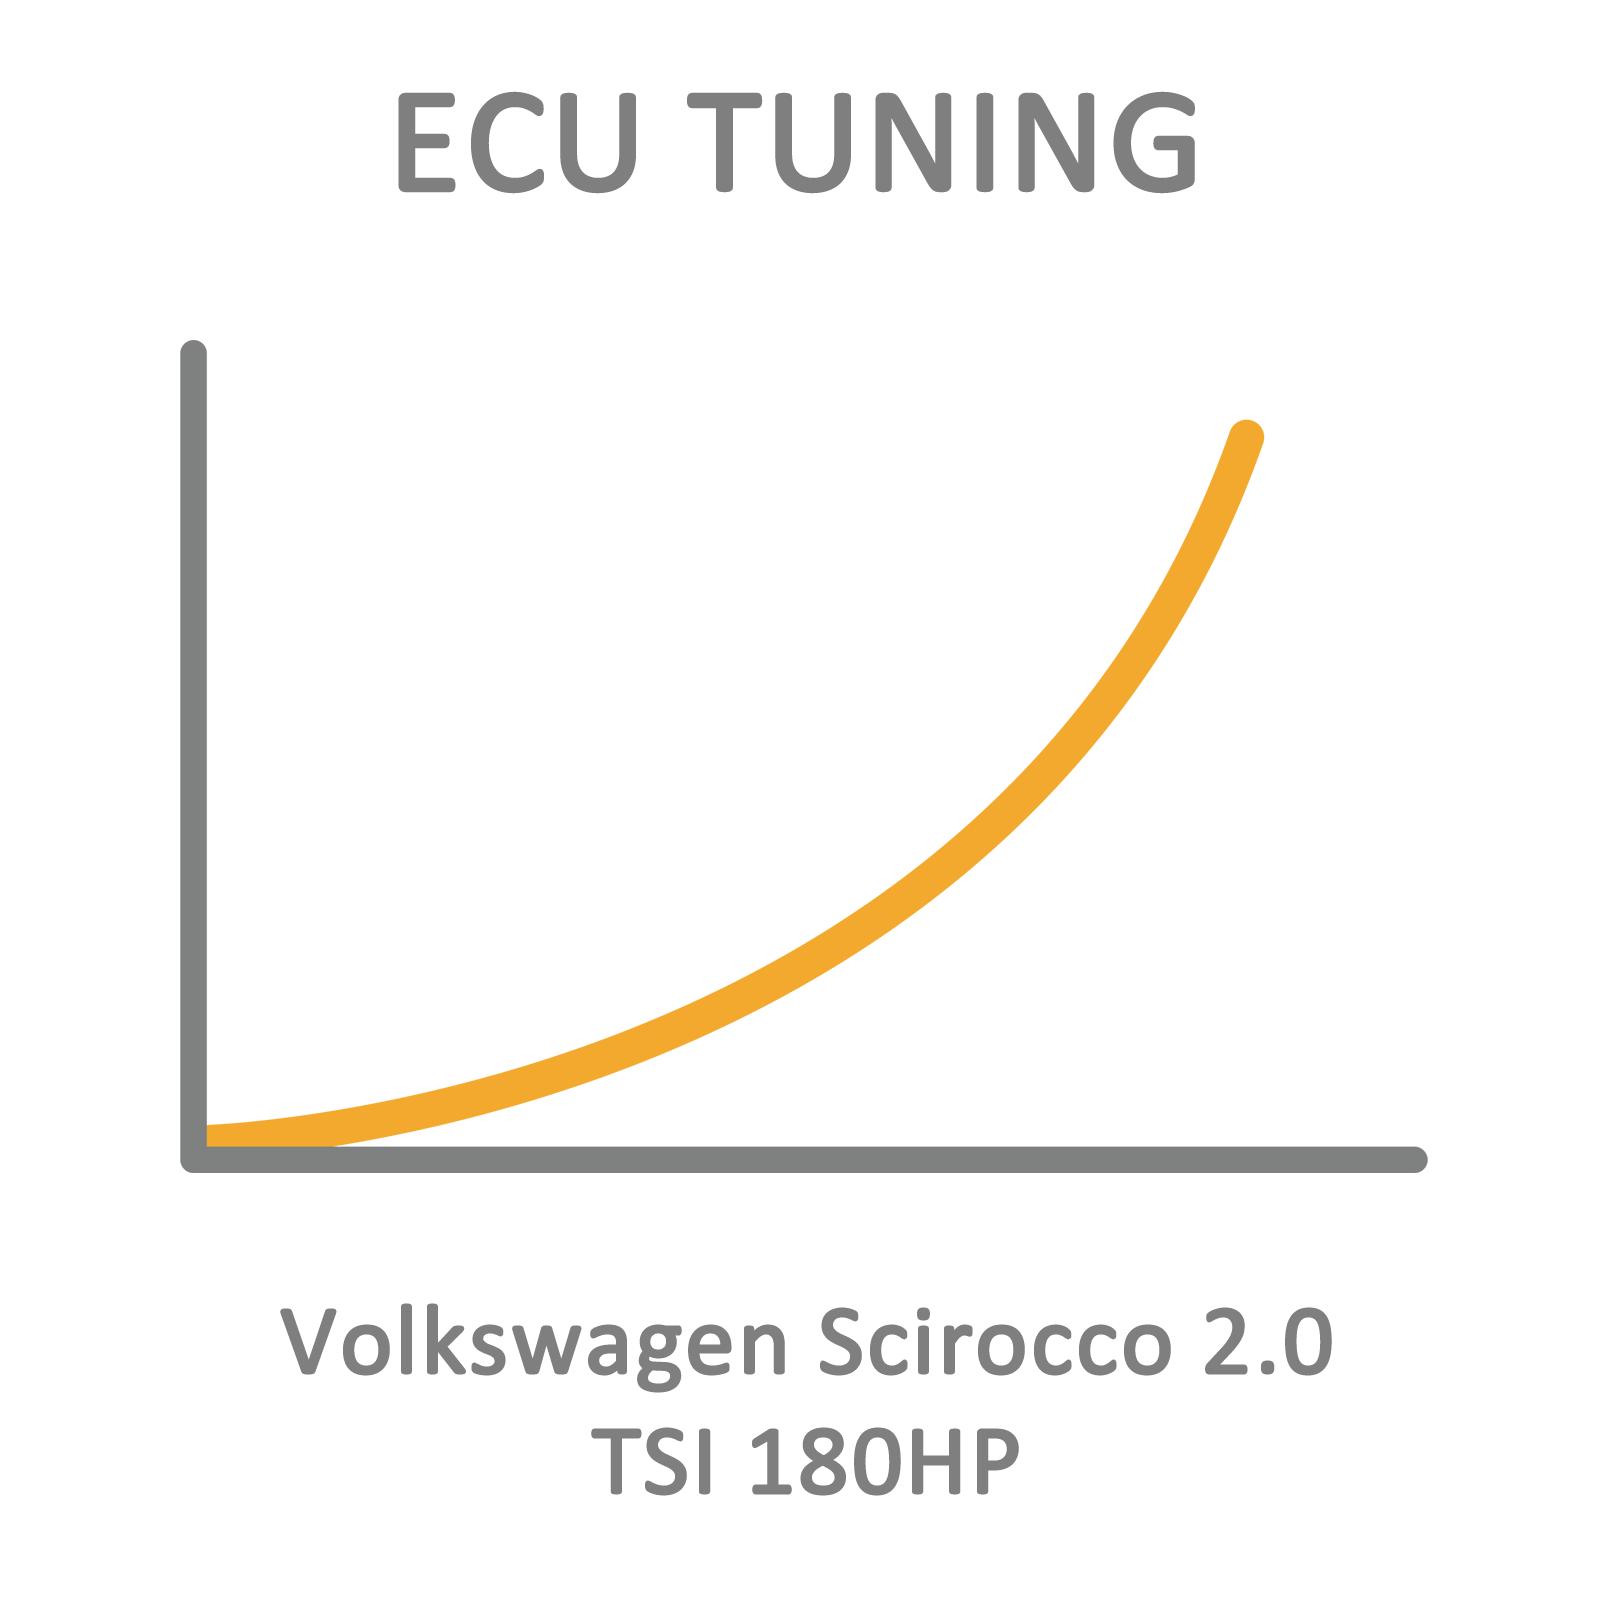 Volkswagen Scirocco 2.0 TSI 180HP ECU Tuning Remapping